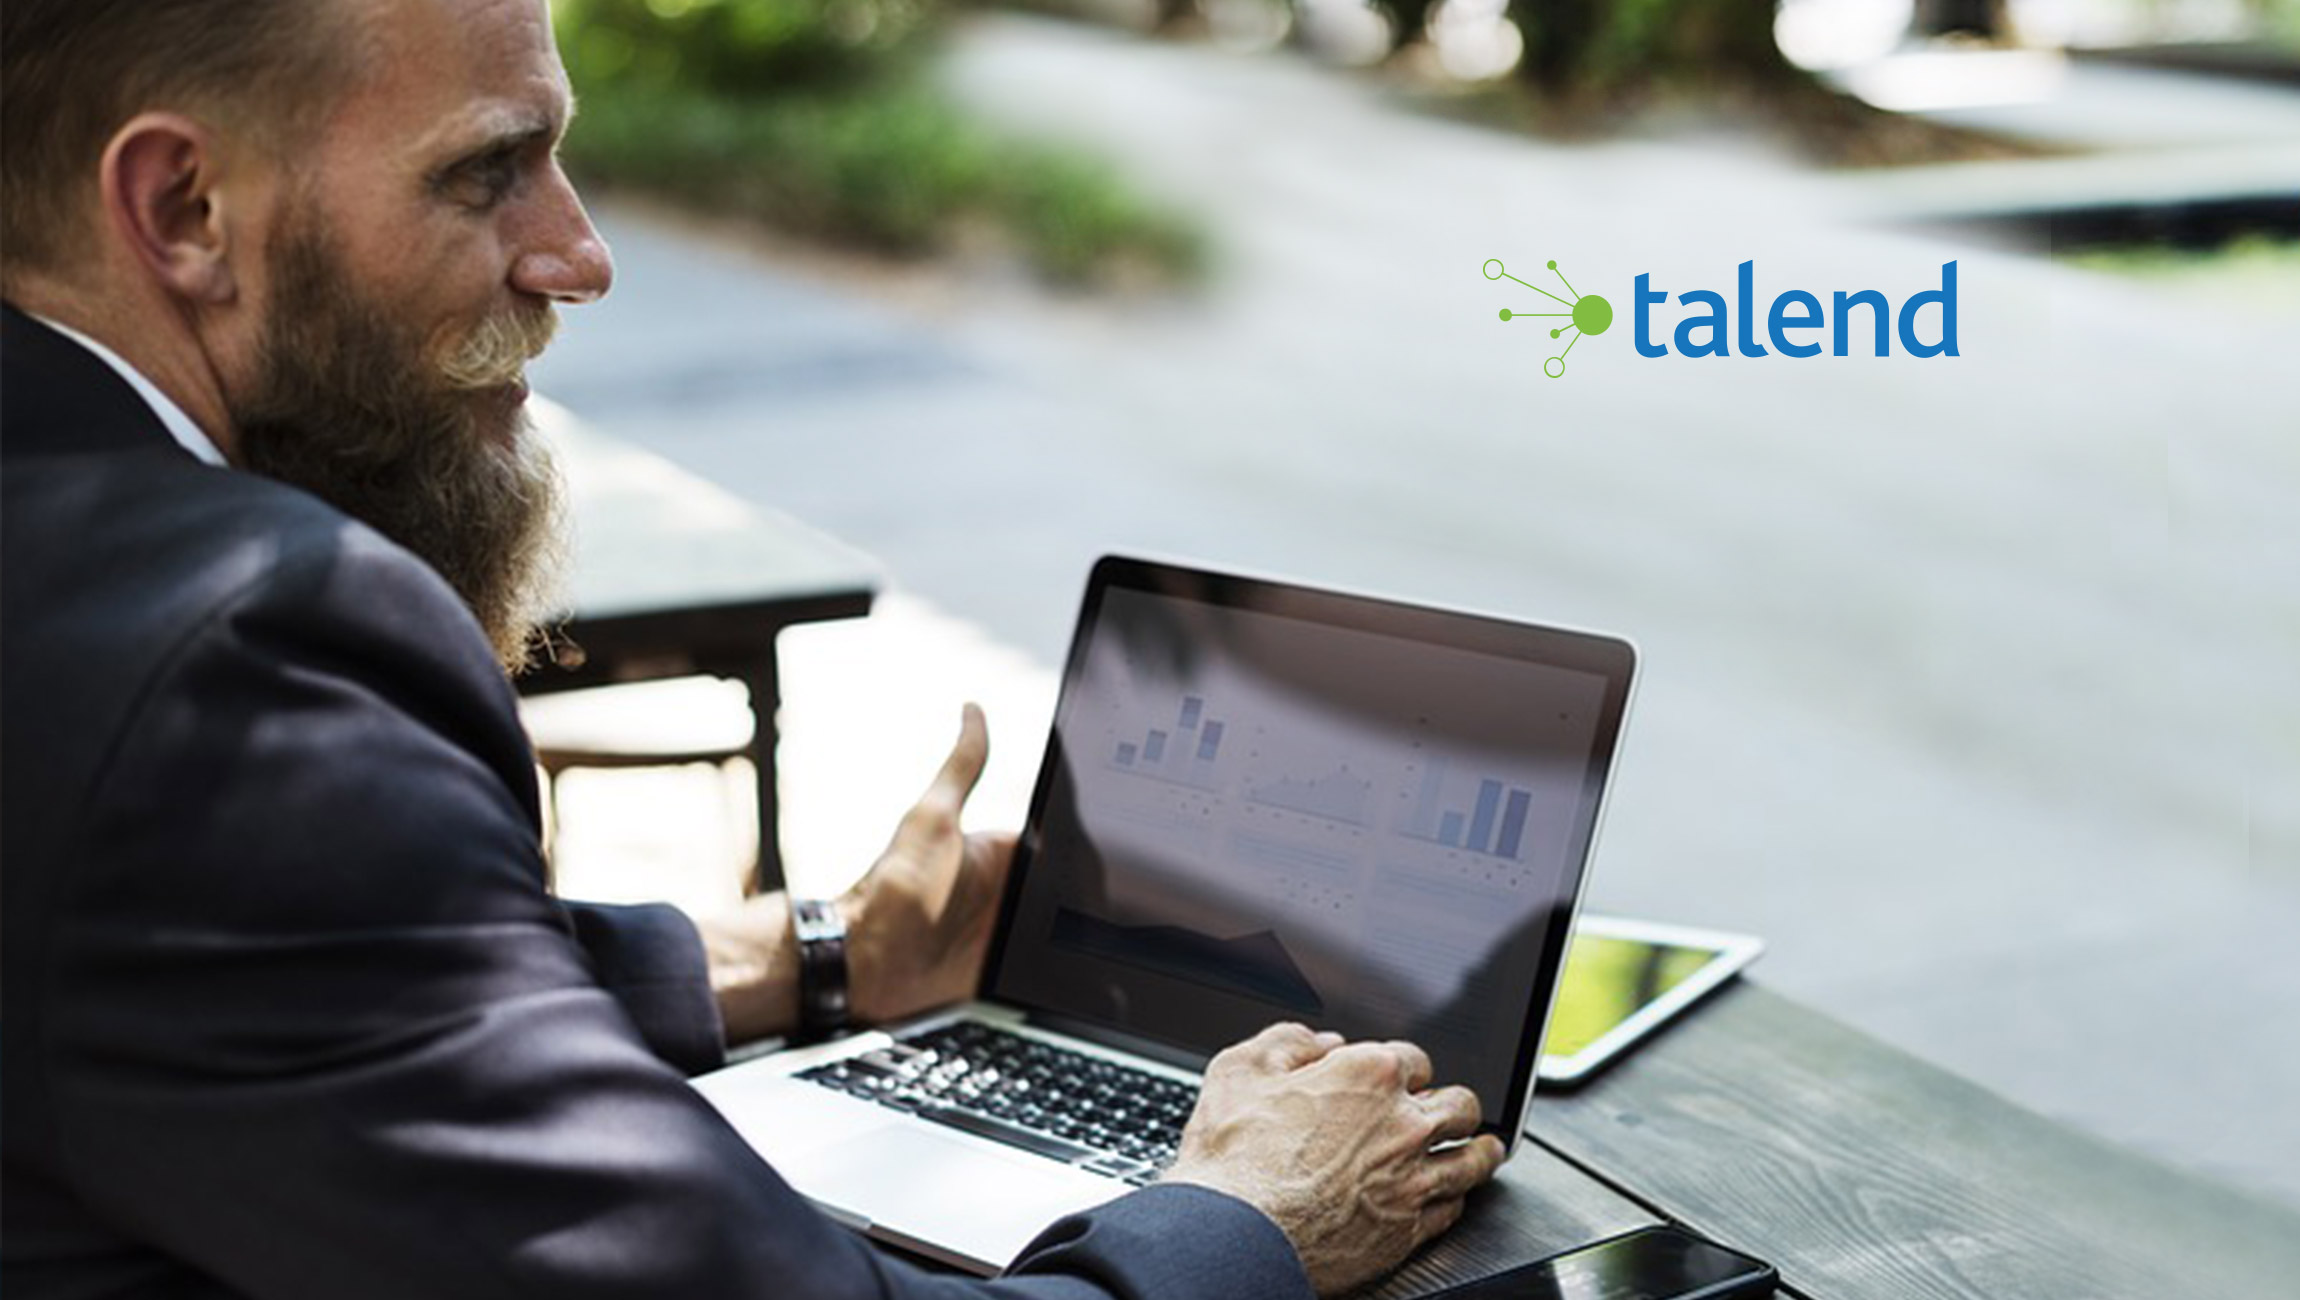 Talend Announces Management Transitions and Preliminary Revenue Estimates for the Fourth Quarter 2018